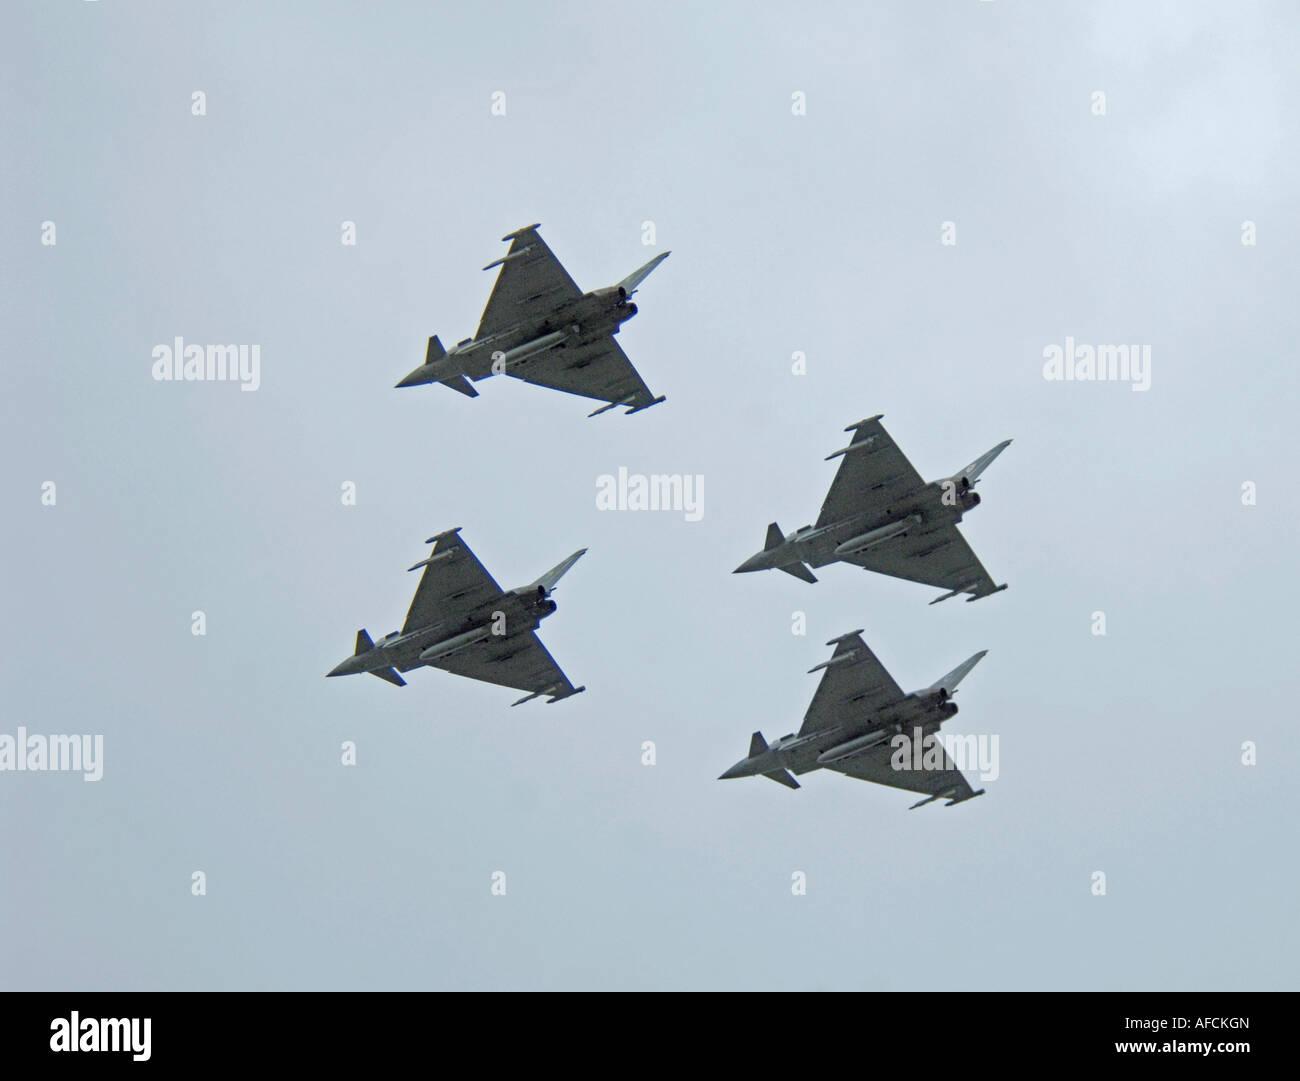 Typhoon Eurofighter 4 Ship Formation Flight - Stock Image